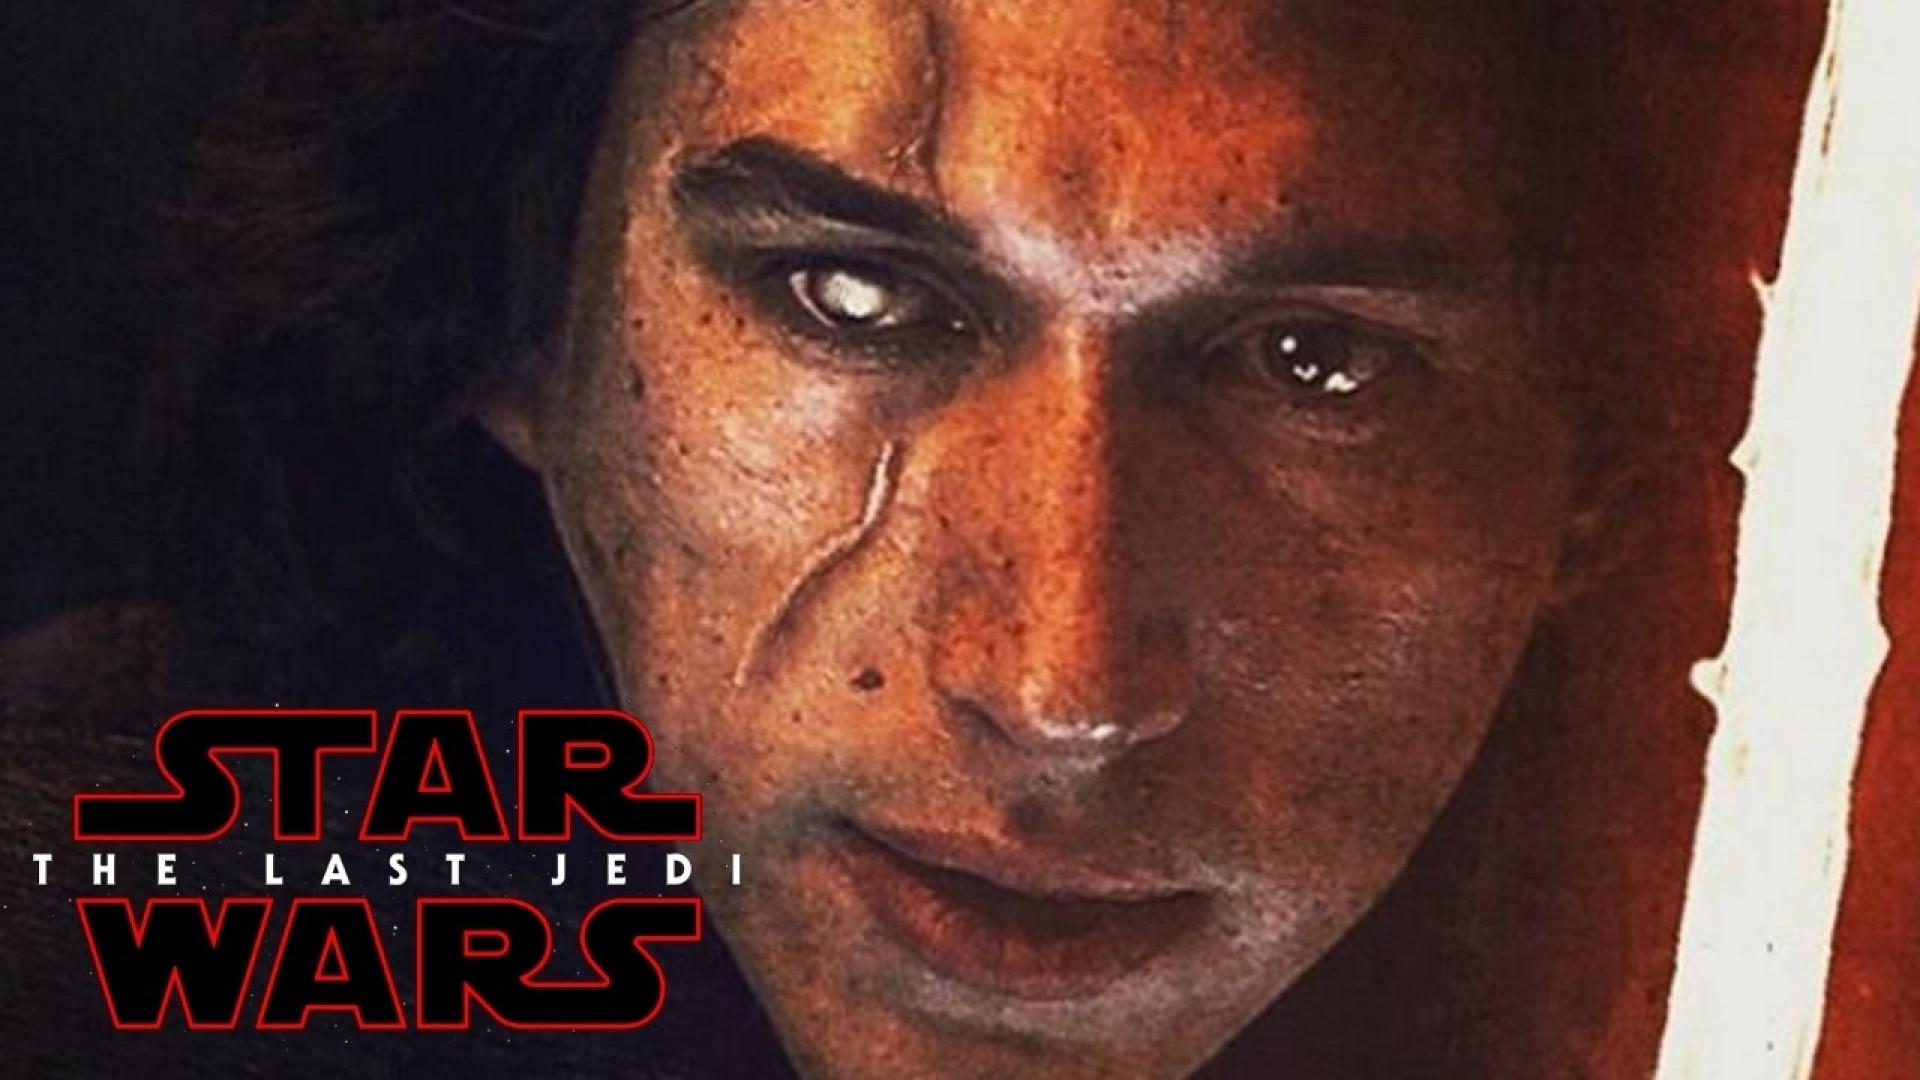 Download Star Wars The Last Jedi Kylo Ren Scar iPhone 7 Wallpapers HD